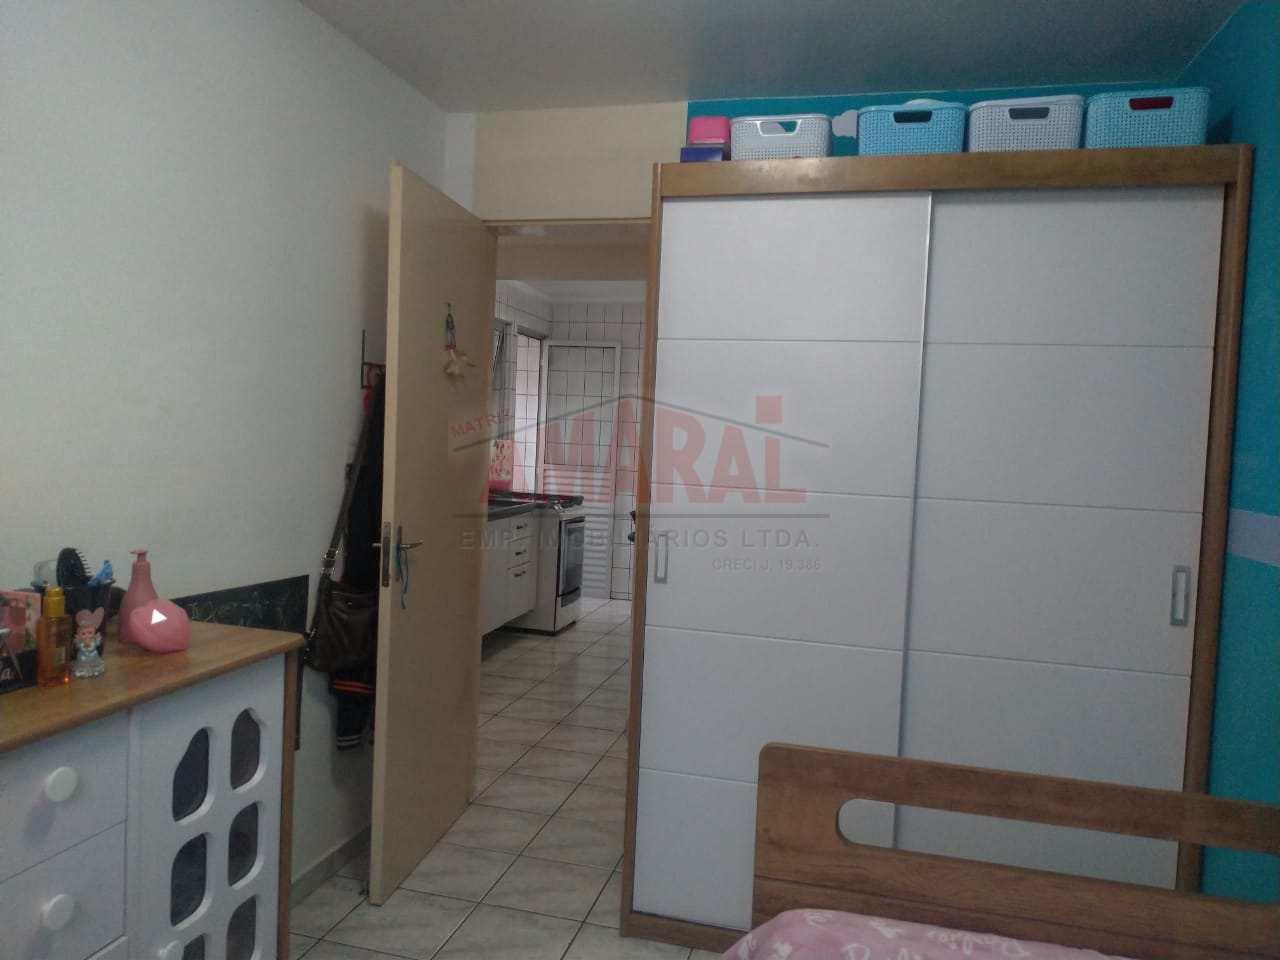 Apartamento com 2 dorms, Cidade Satélite Santa Bárbara, São Paulo - R$ 185 mil, Cod: 11258